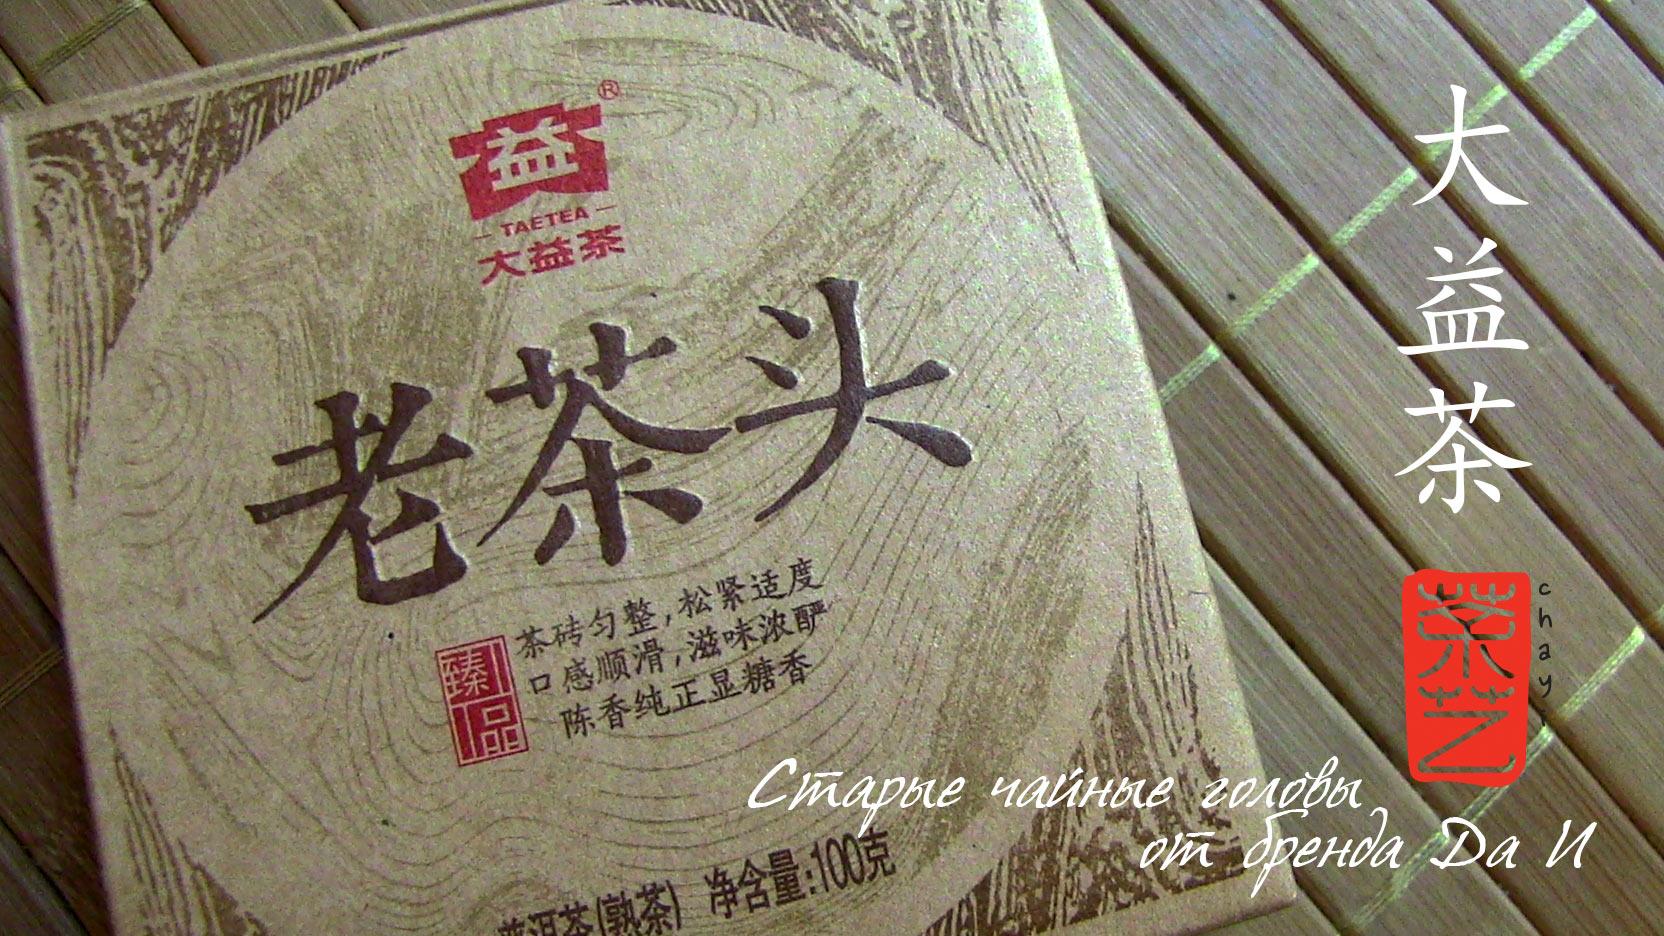 Старые чайные головы от бренда Да И 大益普洱茶老茶头